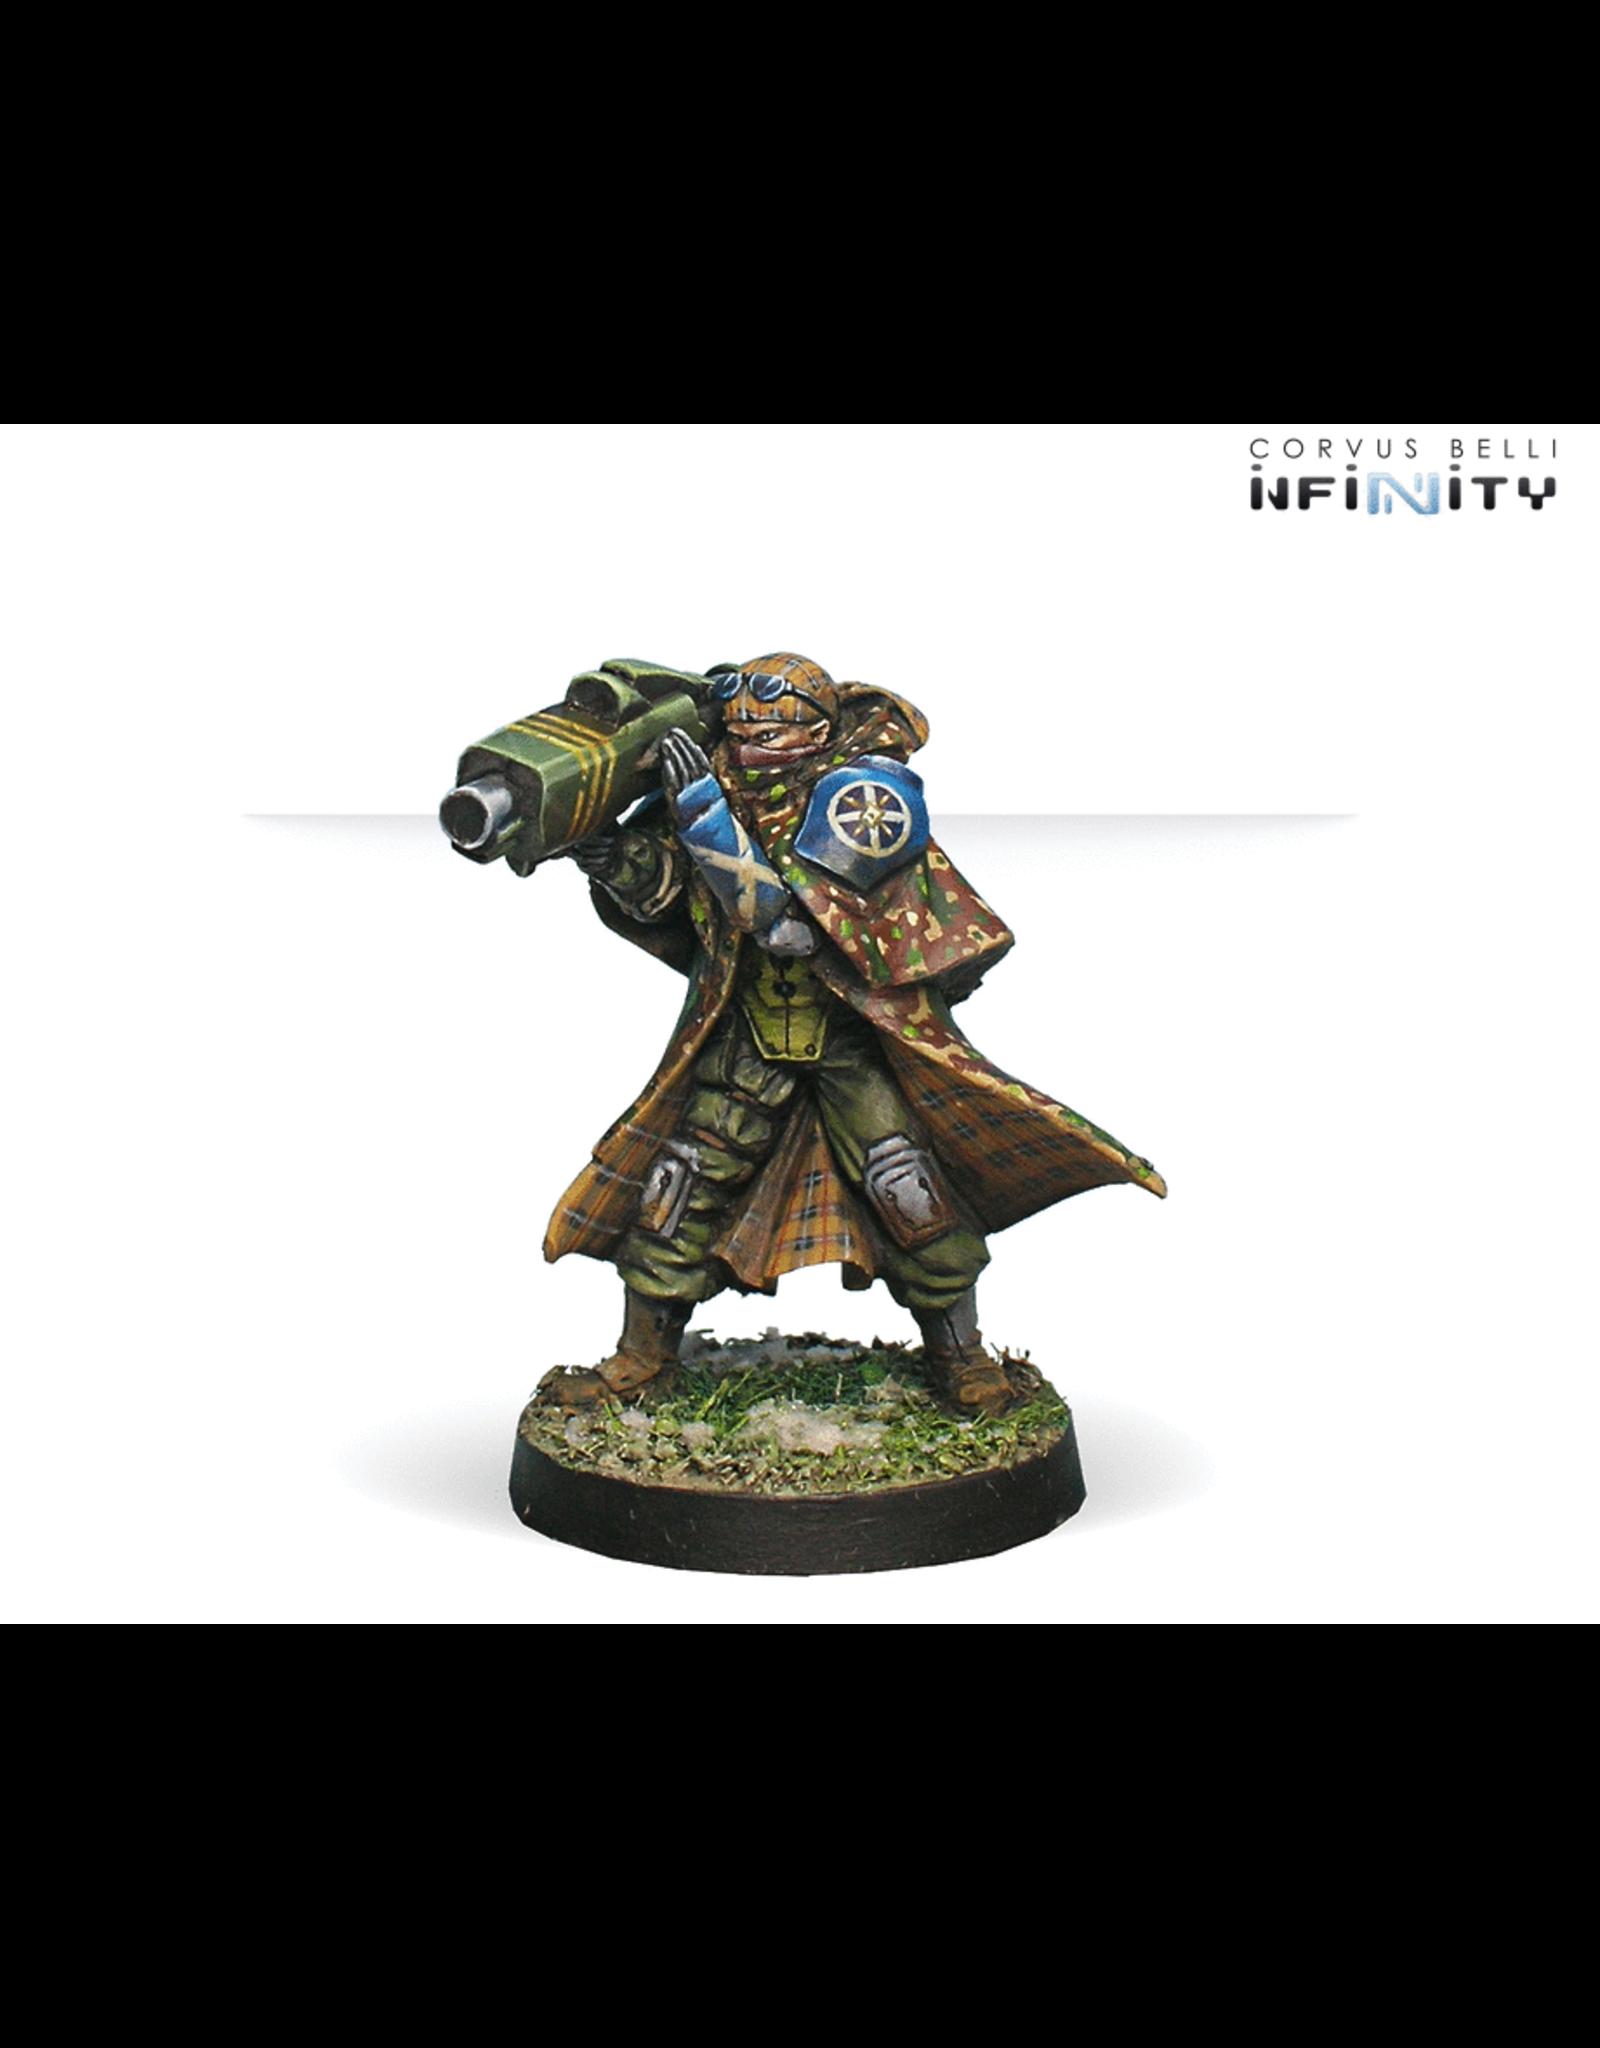 Corvus Belli Infinity: The Scots Guards, 6th Caledonian Infantry Regiment